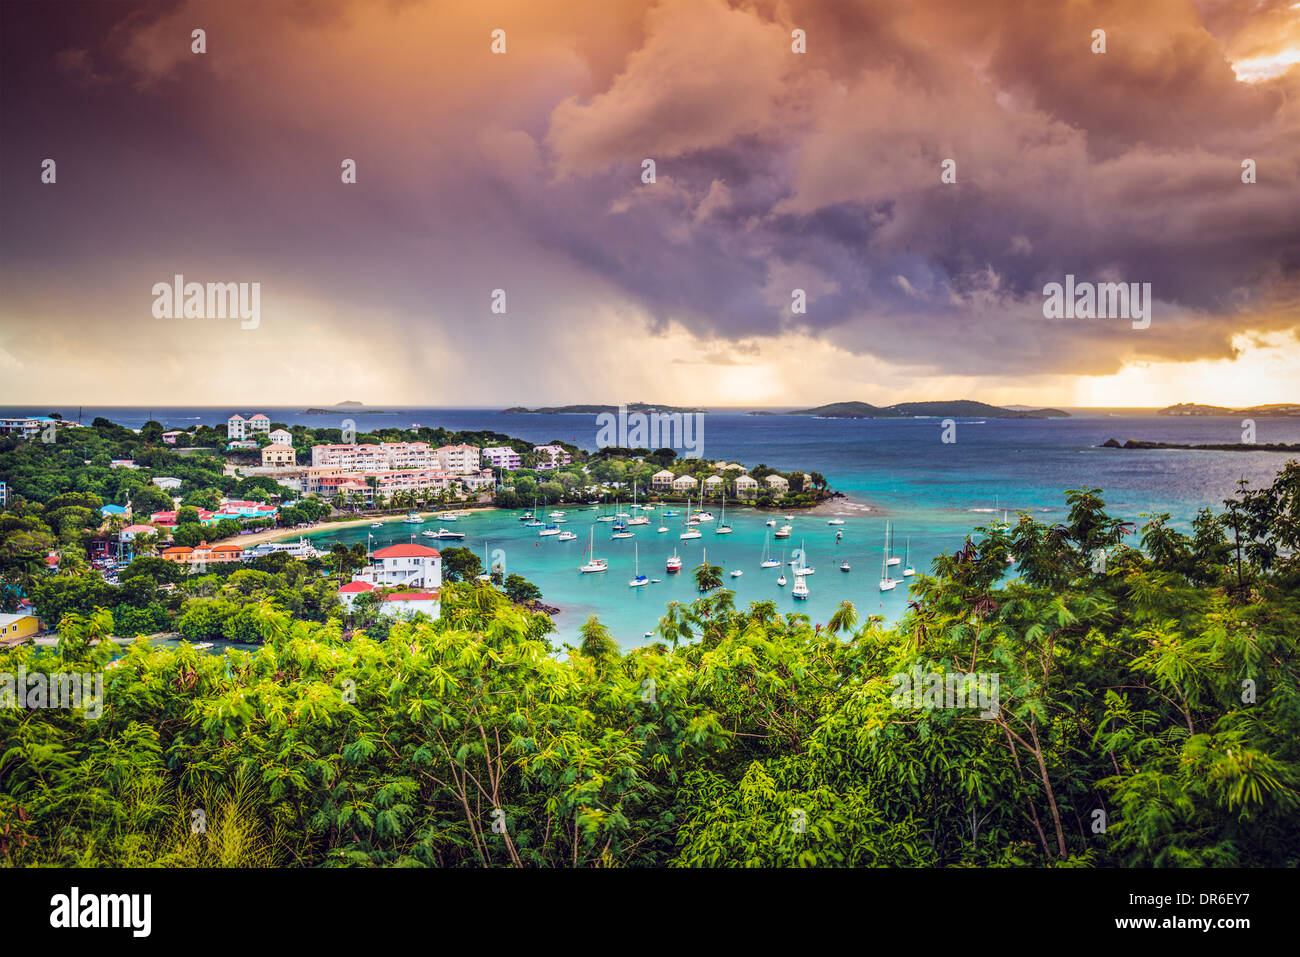 Cruz Bay St John, Stati Uniti Isole Vergini. Immagini Stock